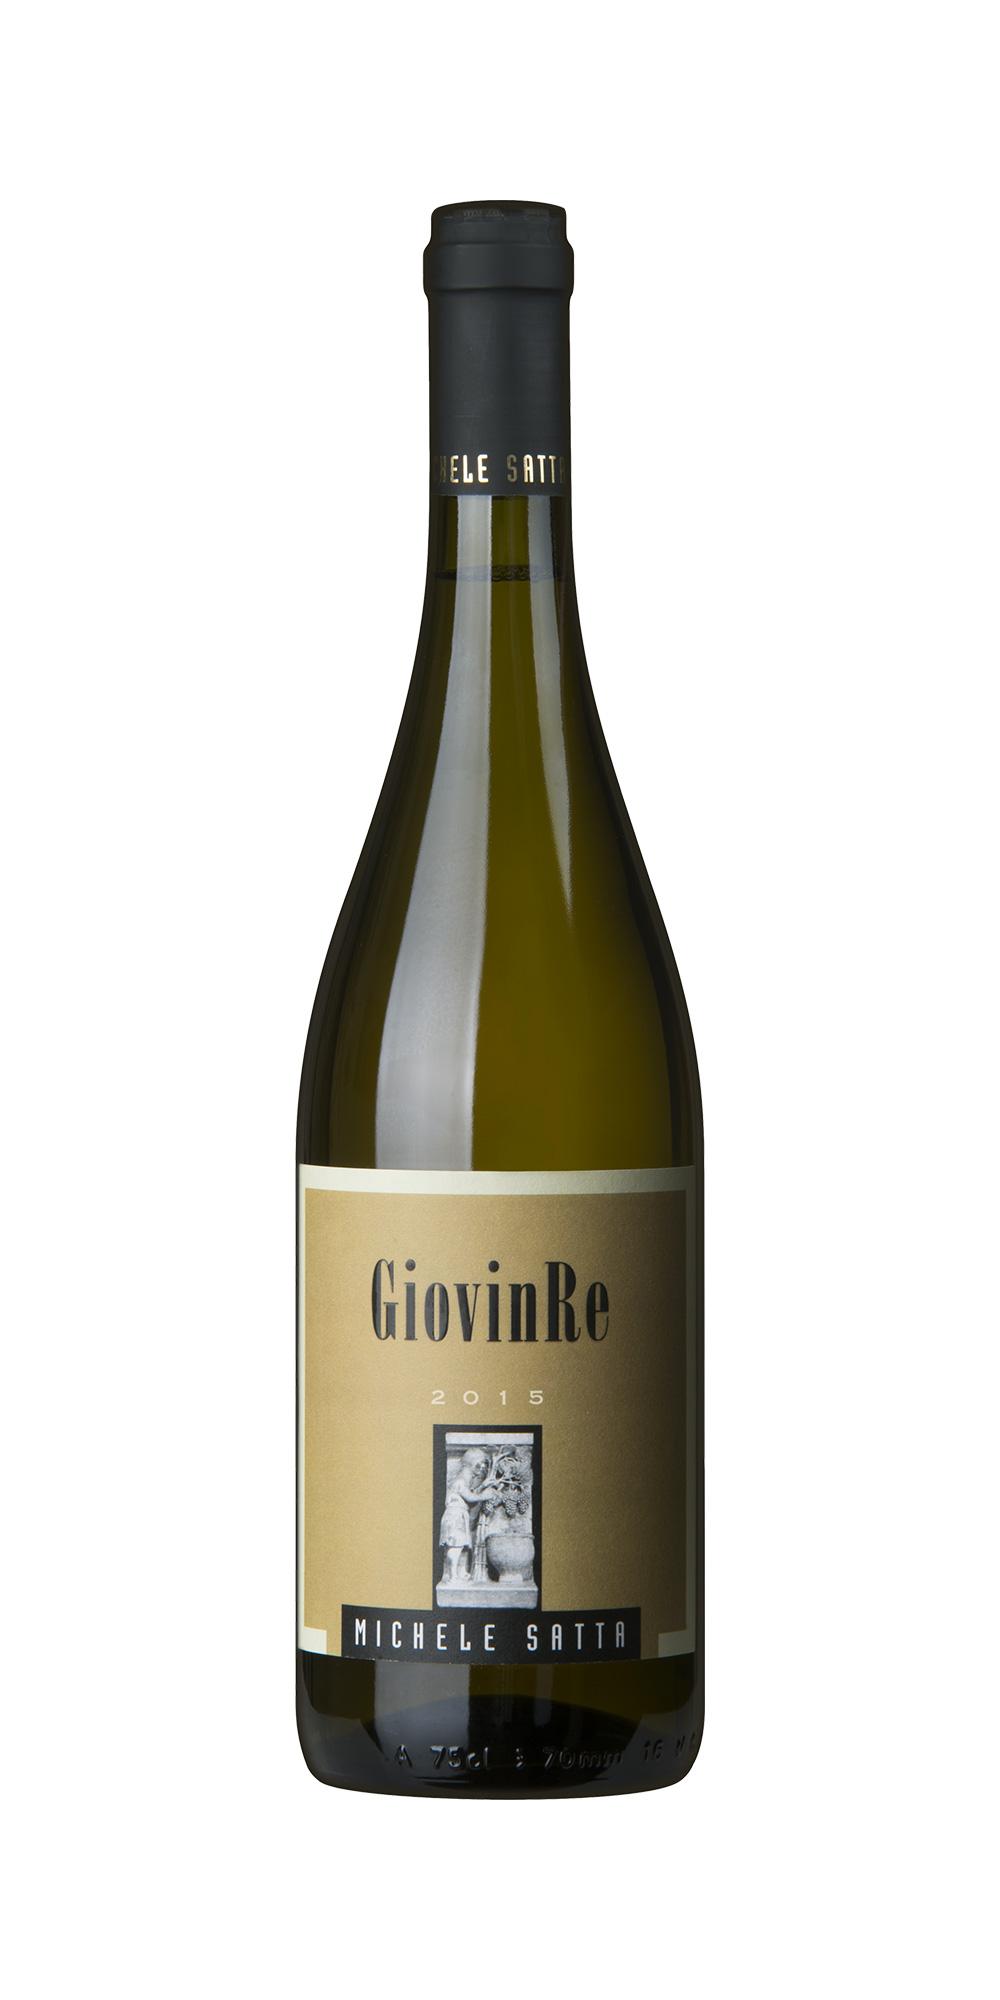 Vino bianco Giovin Re Toscana